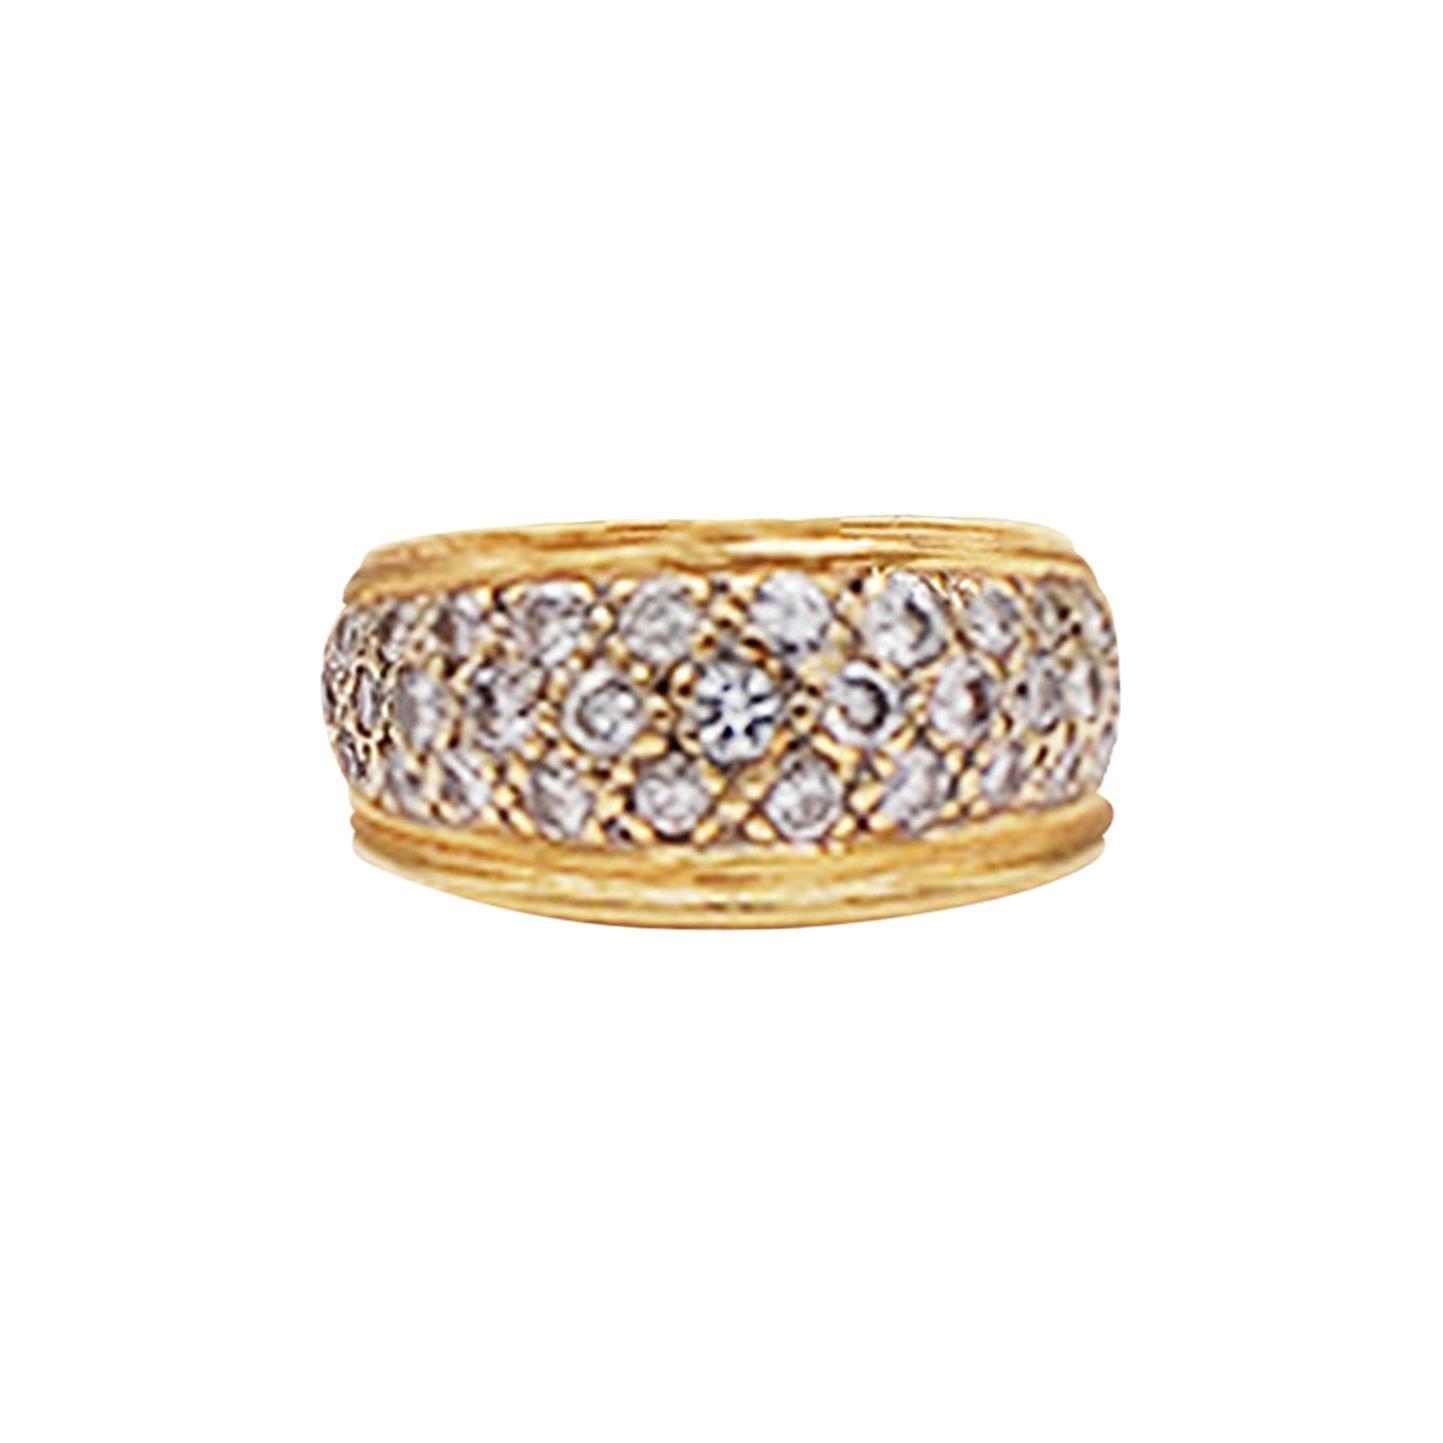 Pave Diamond Dome Band Ring 1 Carat VS Quality Diamonds Yellow Gold